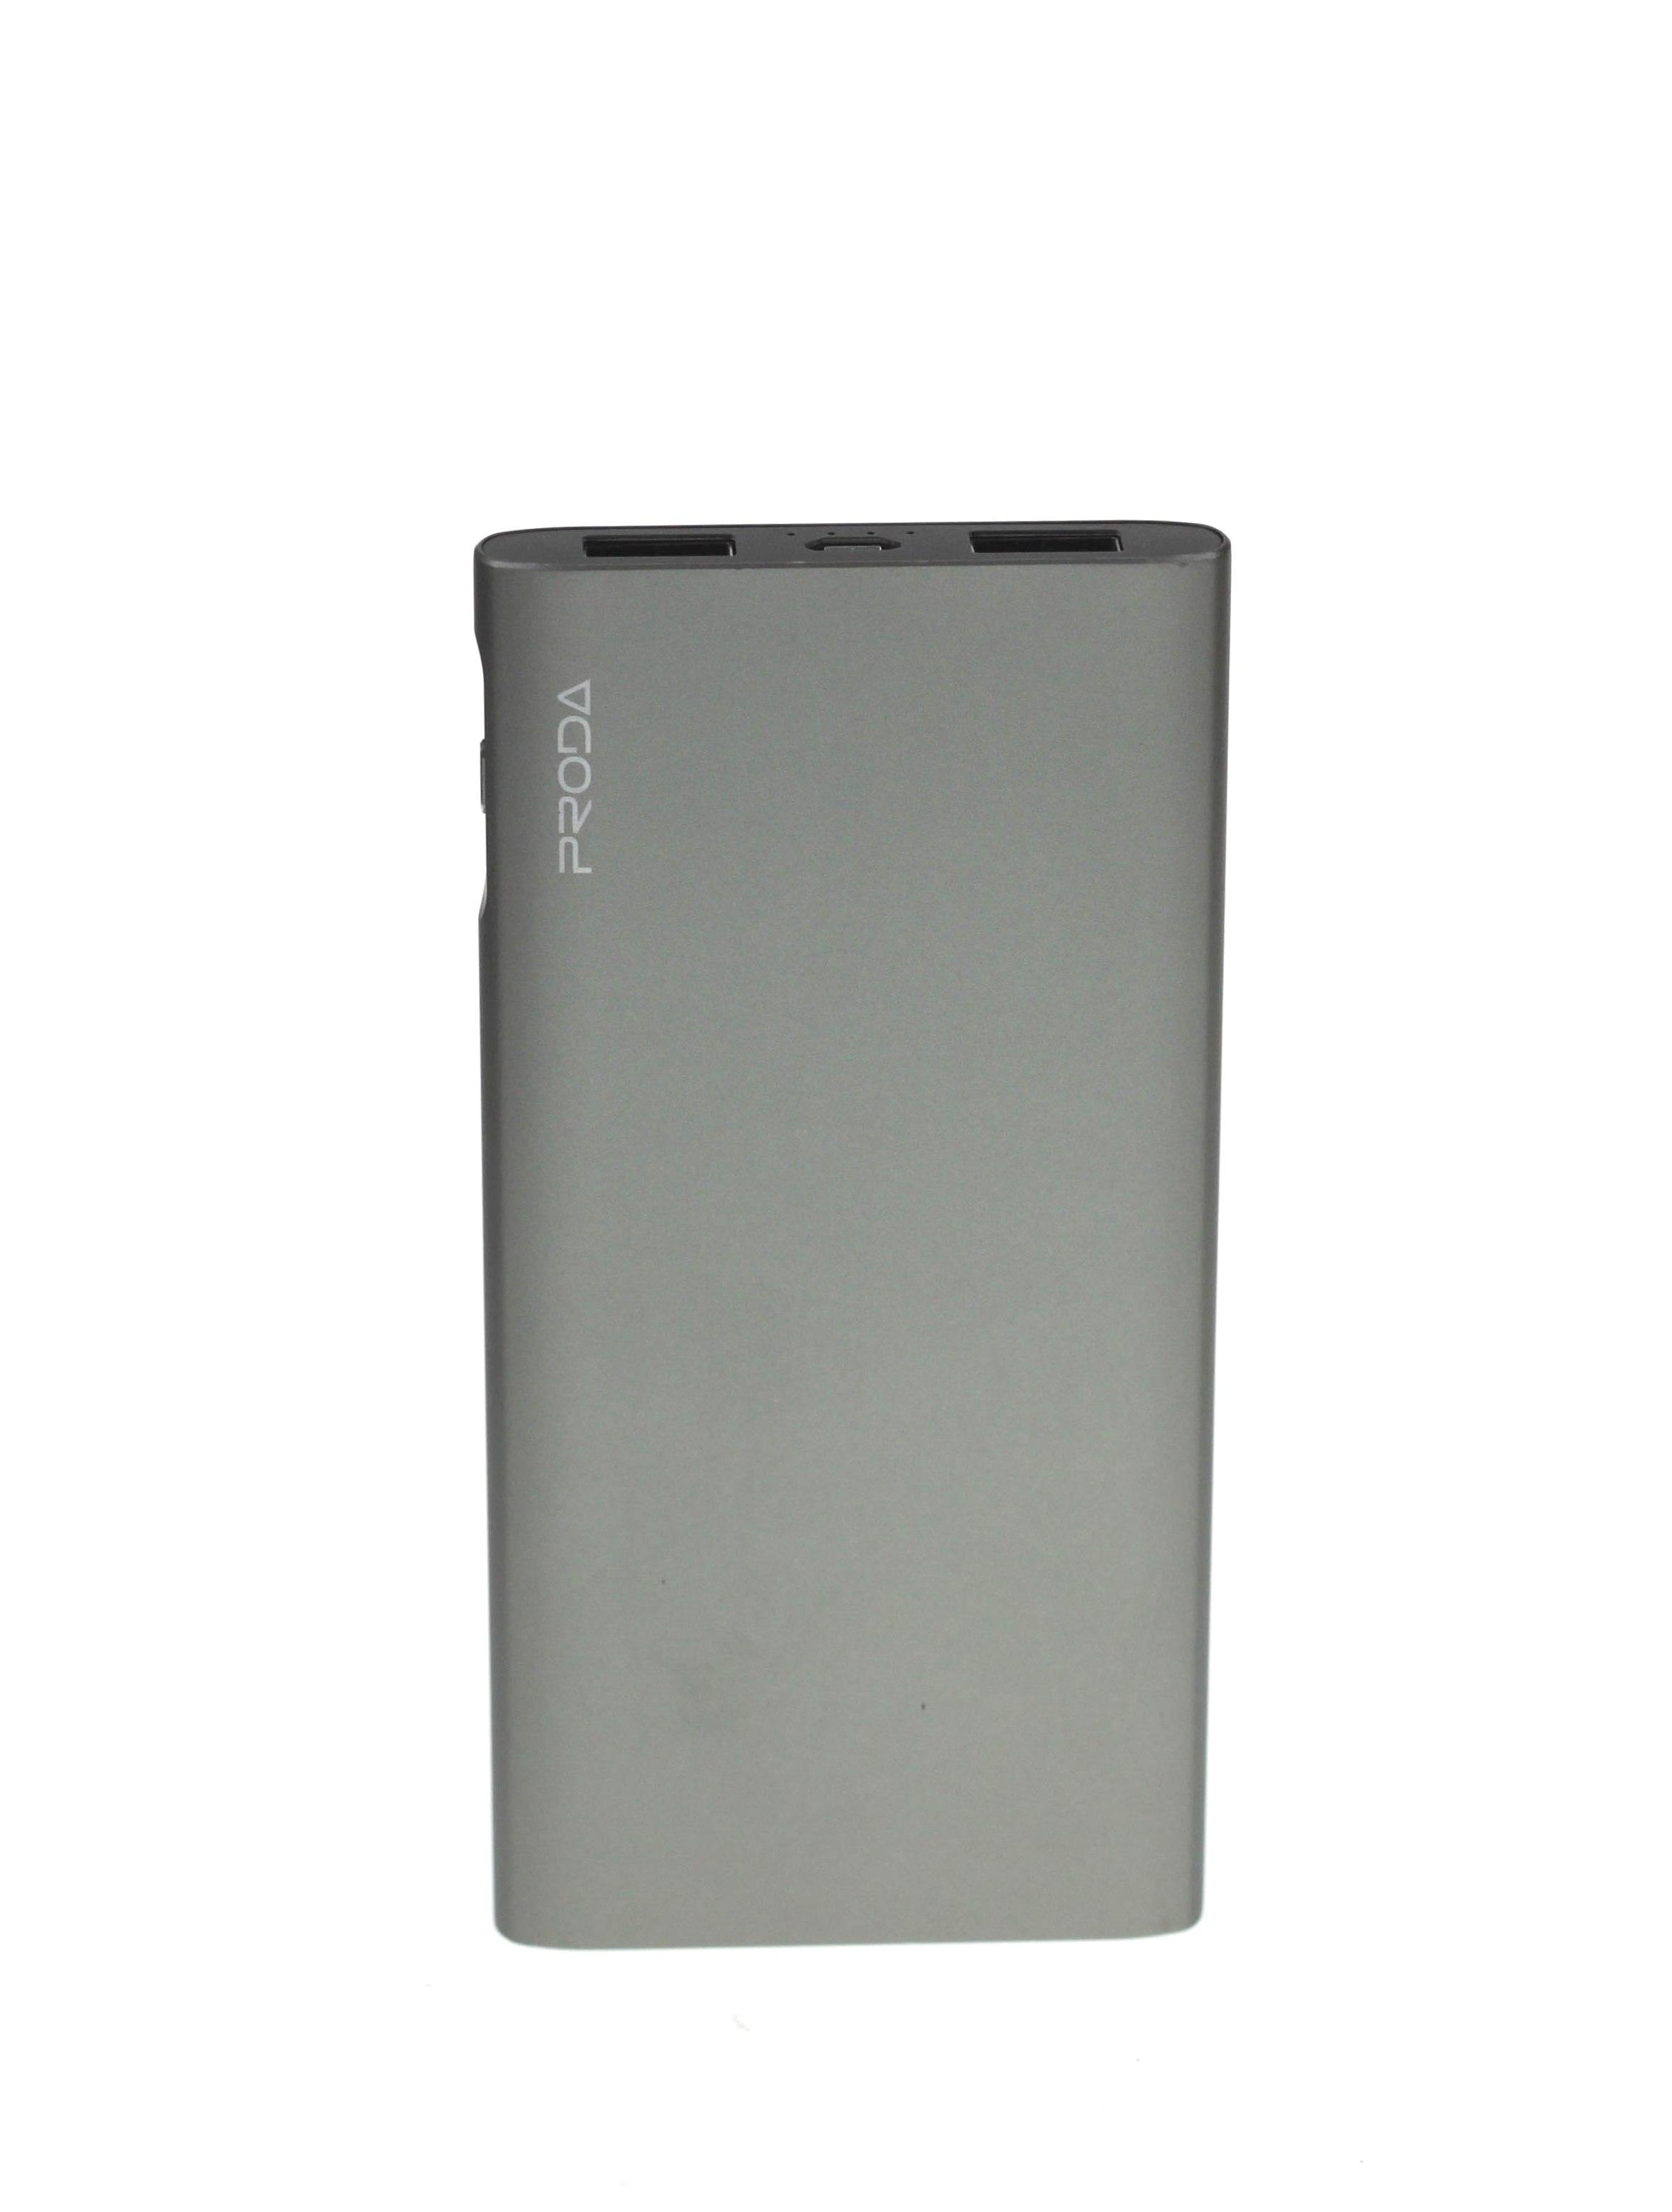 Power bank 10.000mAh,REMAX PPP-13 Proda,šedá